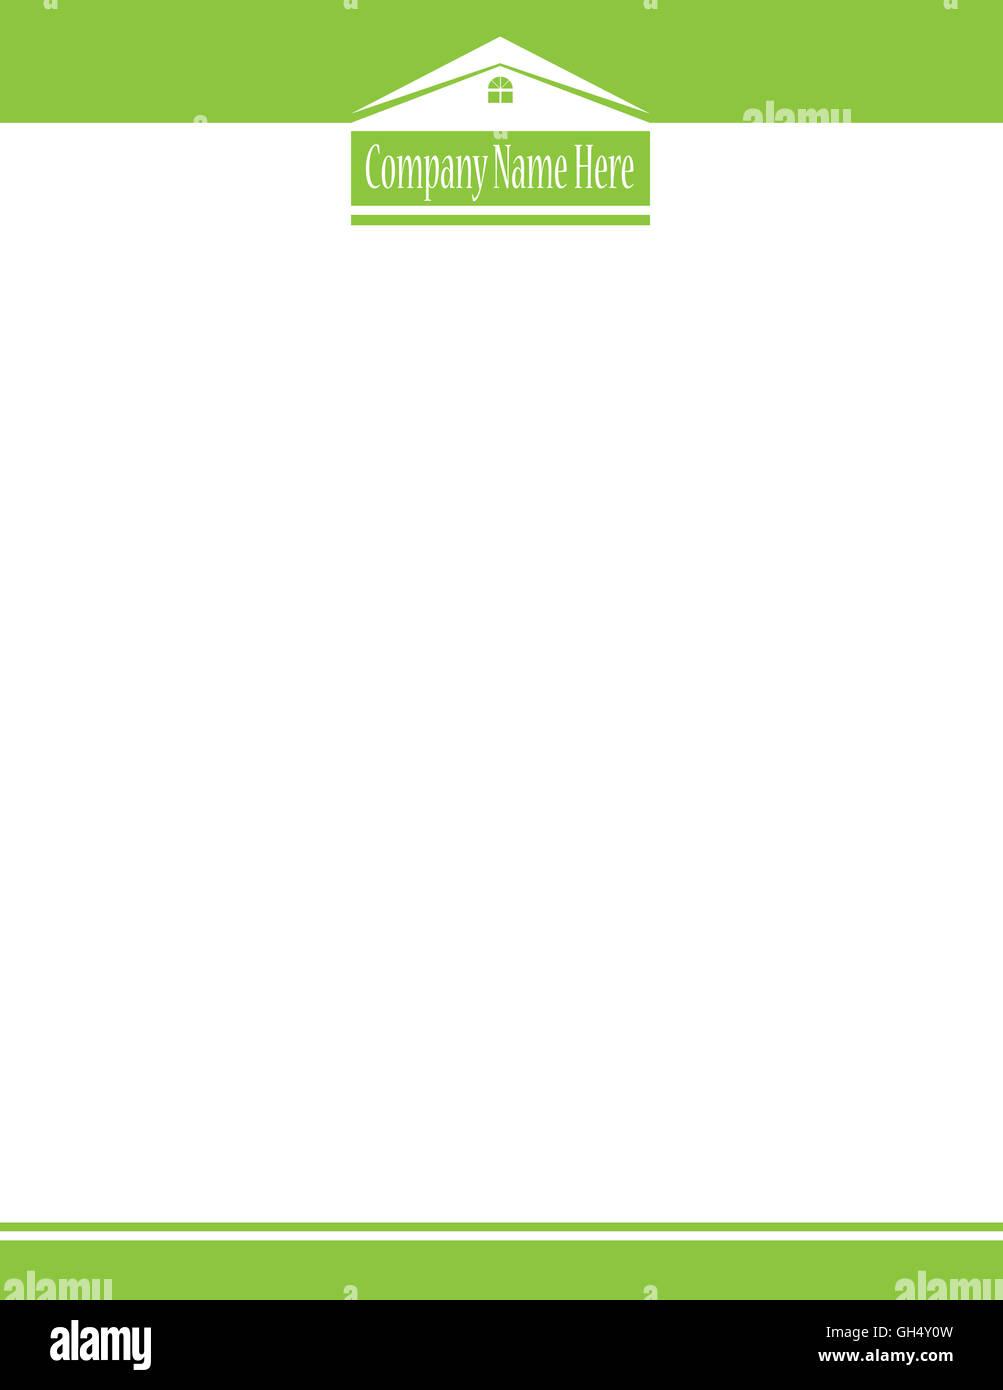 Green House Real Estate Logo Letterhead Template - Stock Image